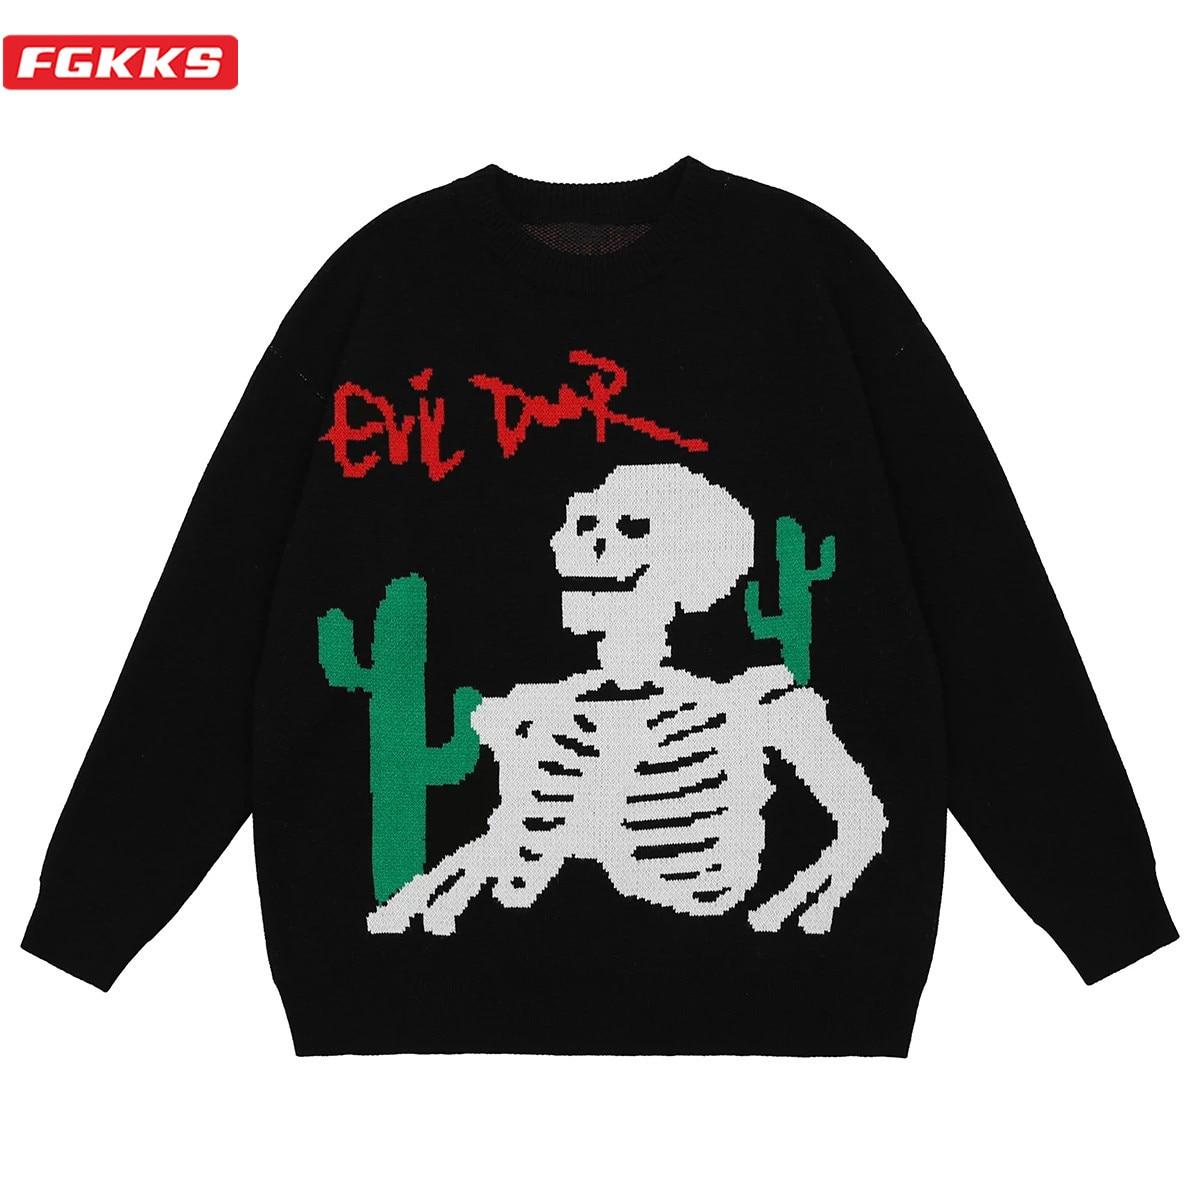 FGKKS Men Oversized Sweater Black Loose Cactus Skeleton Bone Printed High Quality High Street Vintage Knitted Pullover Sweater